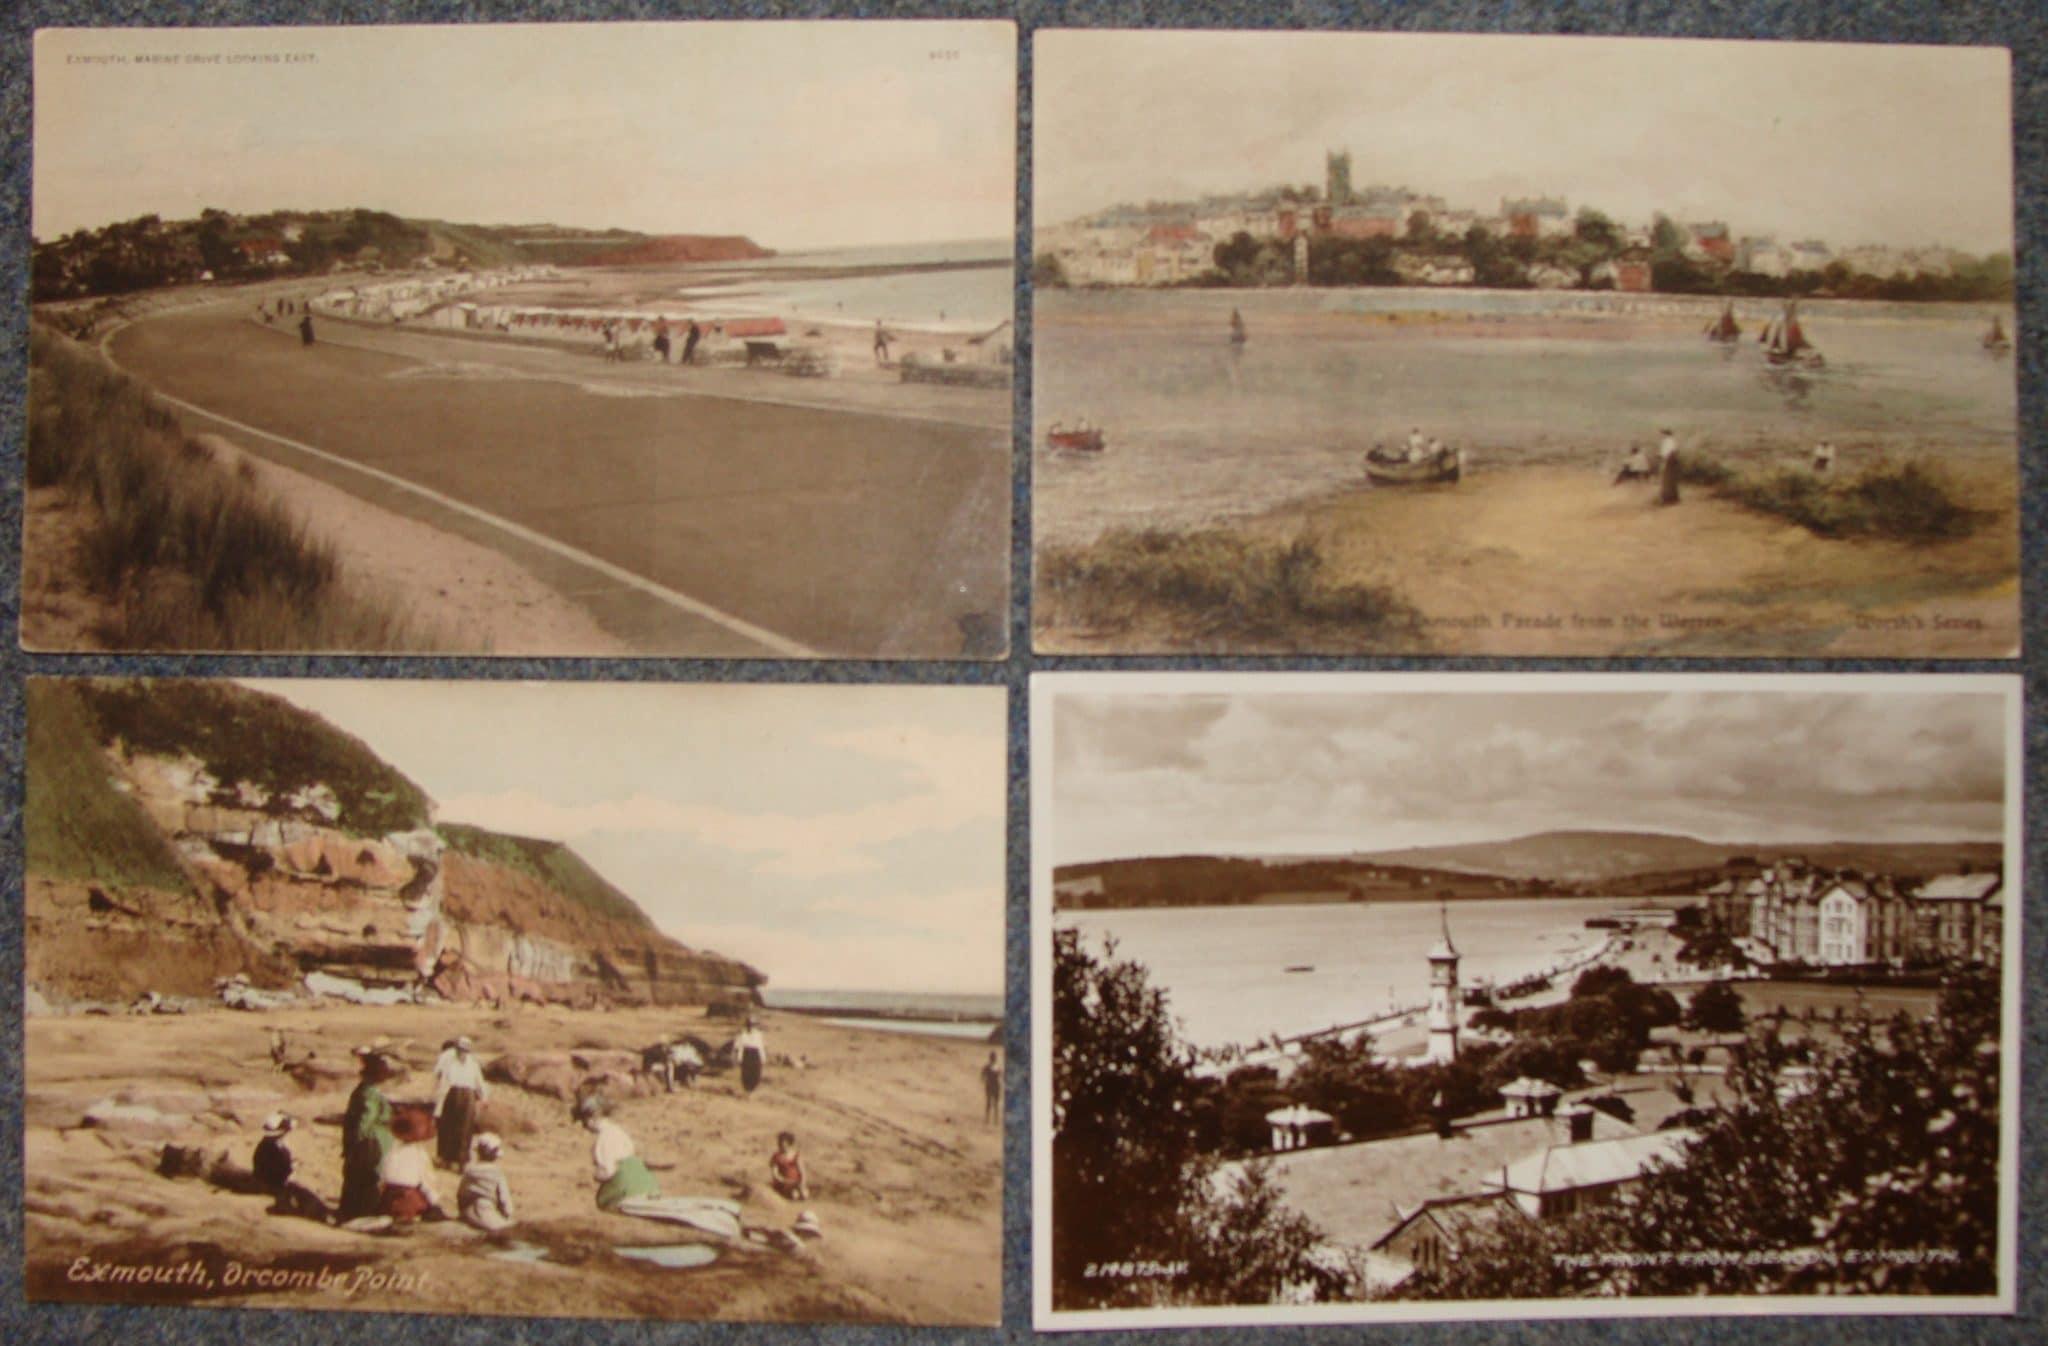 Image 2e: Historical photos of Exmouth and Dawlish Warren